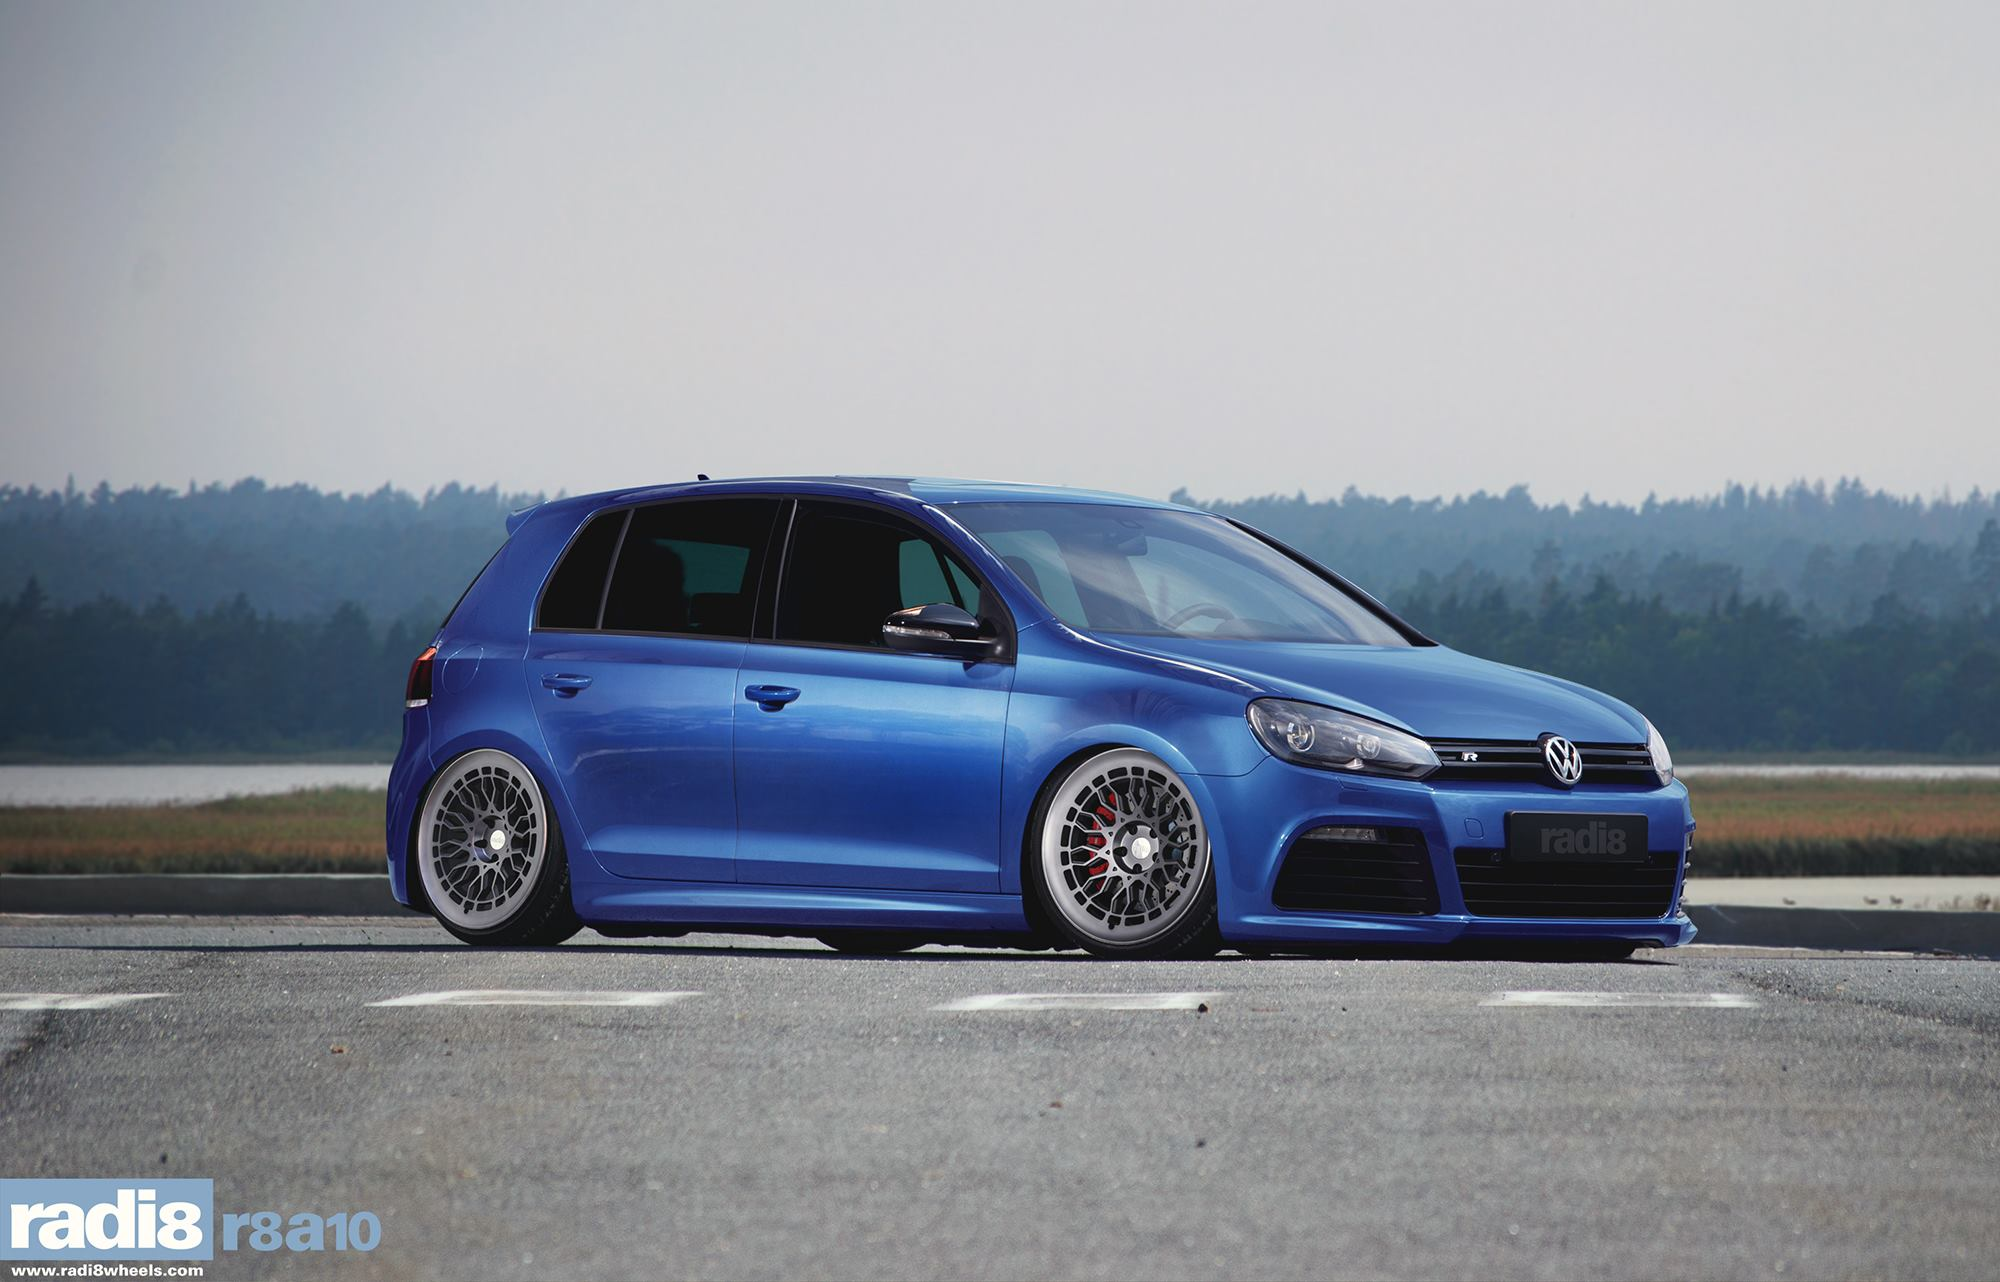 Radi8 R8A10 - Volkswagen Golf R